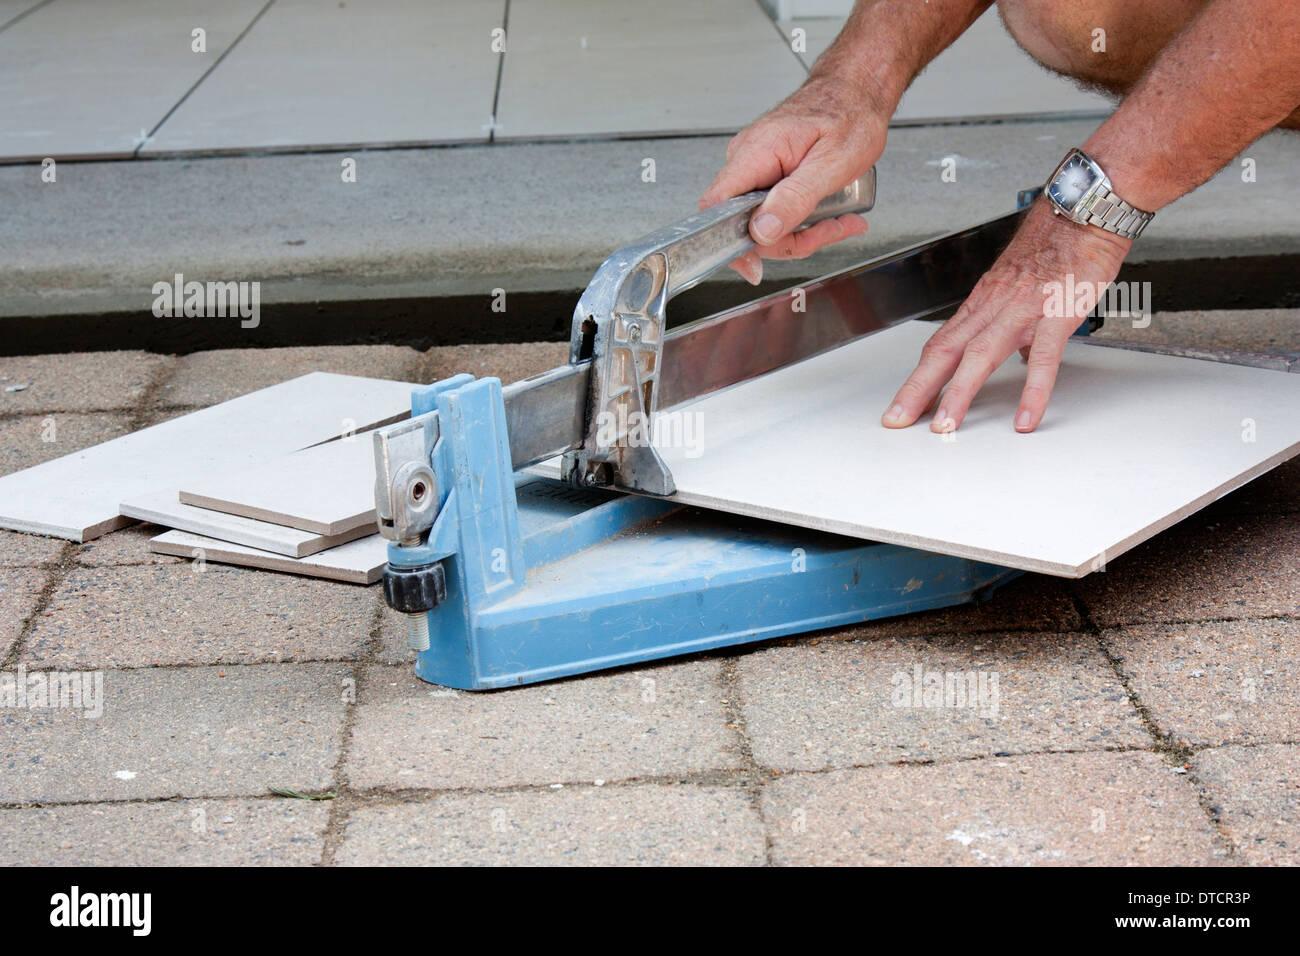 Dremel ceramic tile cutting bit columbialabelsfo dremel floor tile cutting bit images imperial premier two piece dailygadgetfo Images